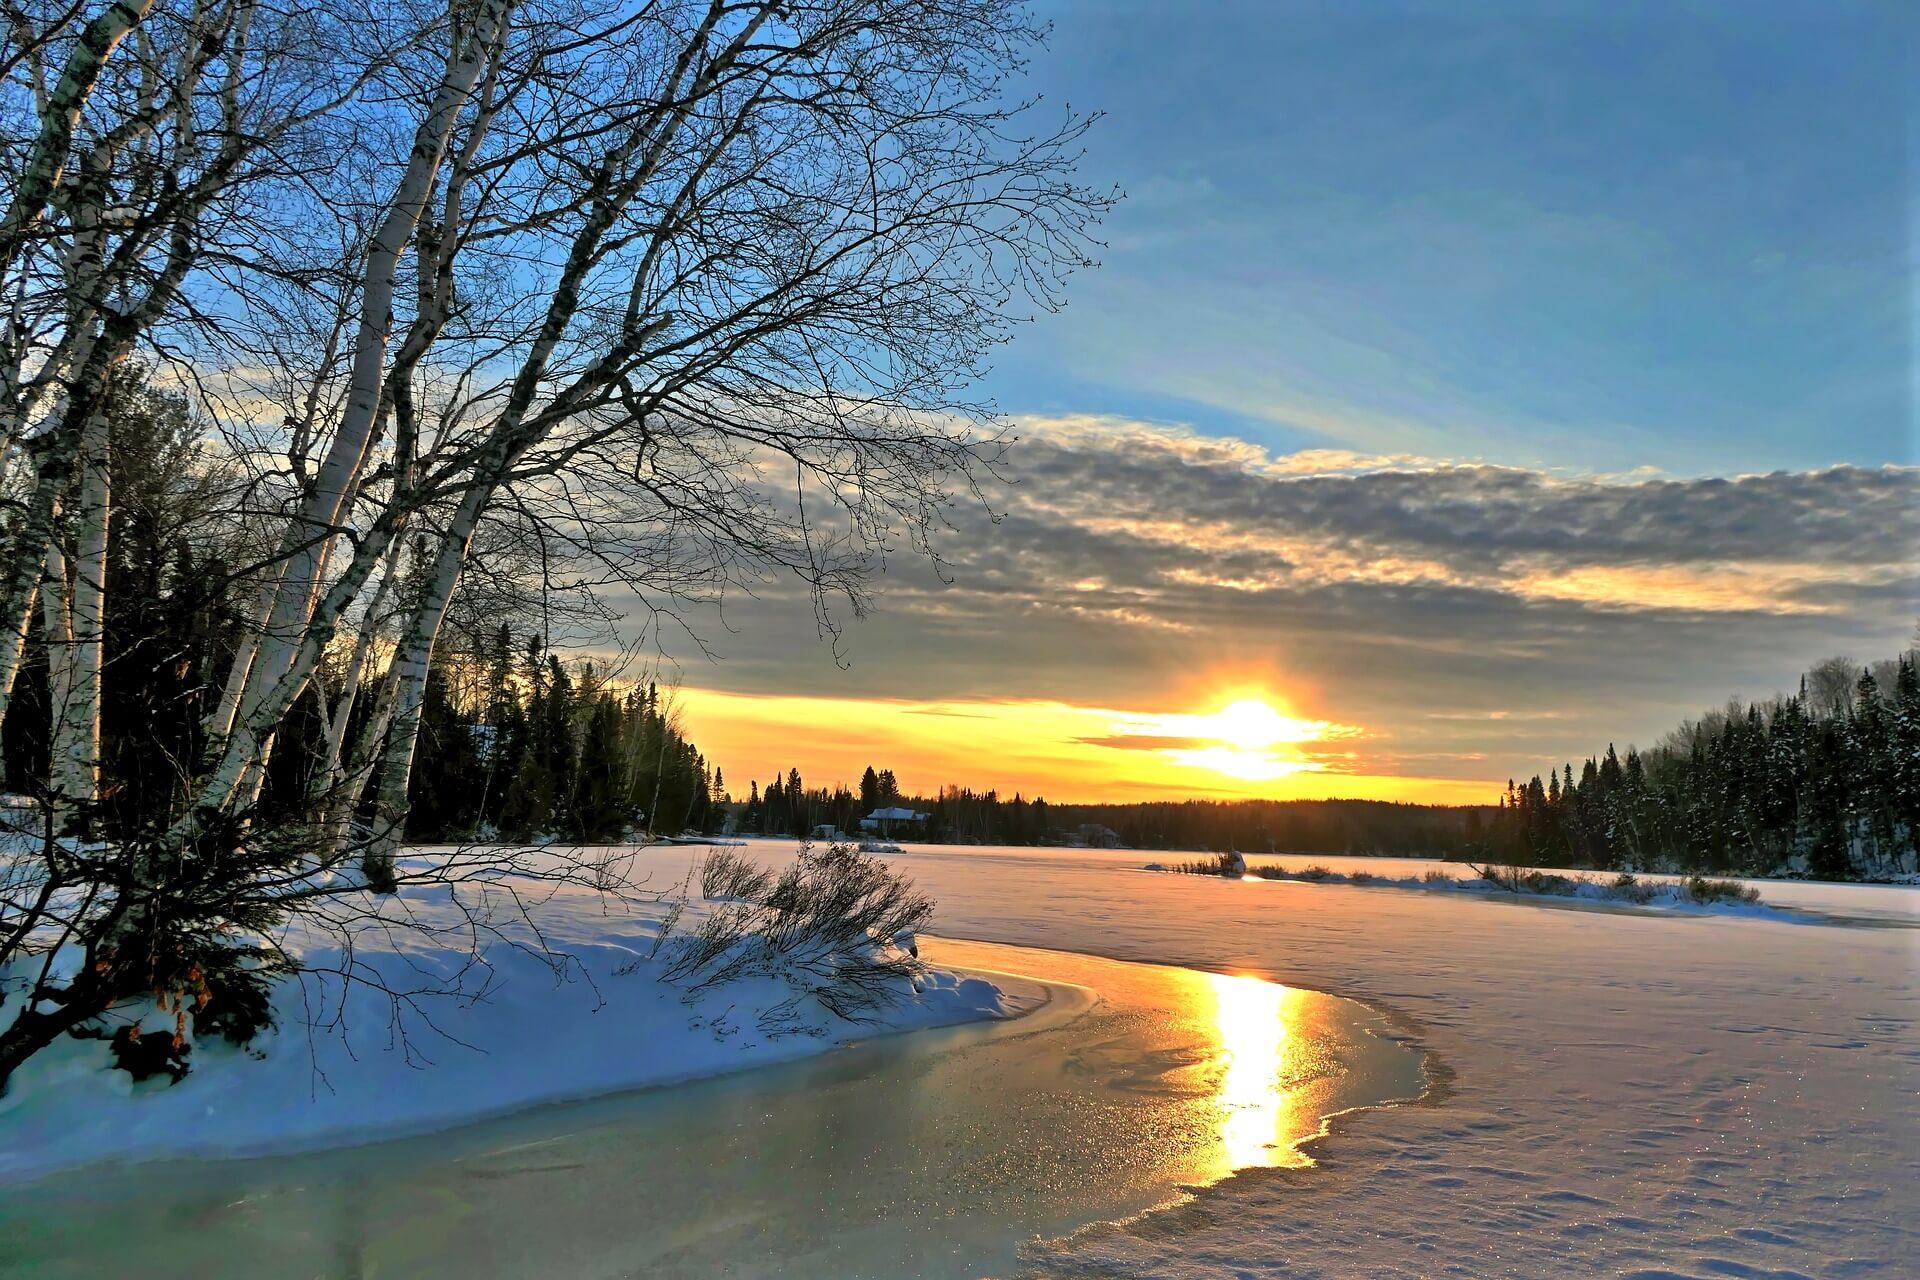 sunset-3871163_1920